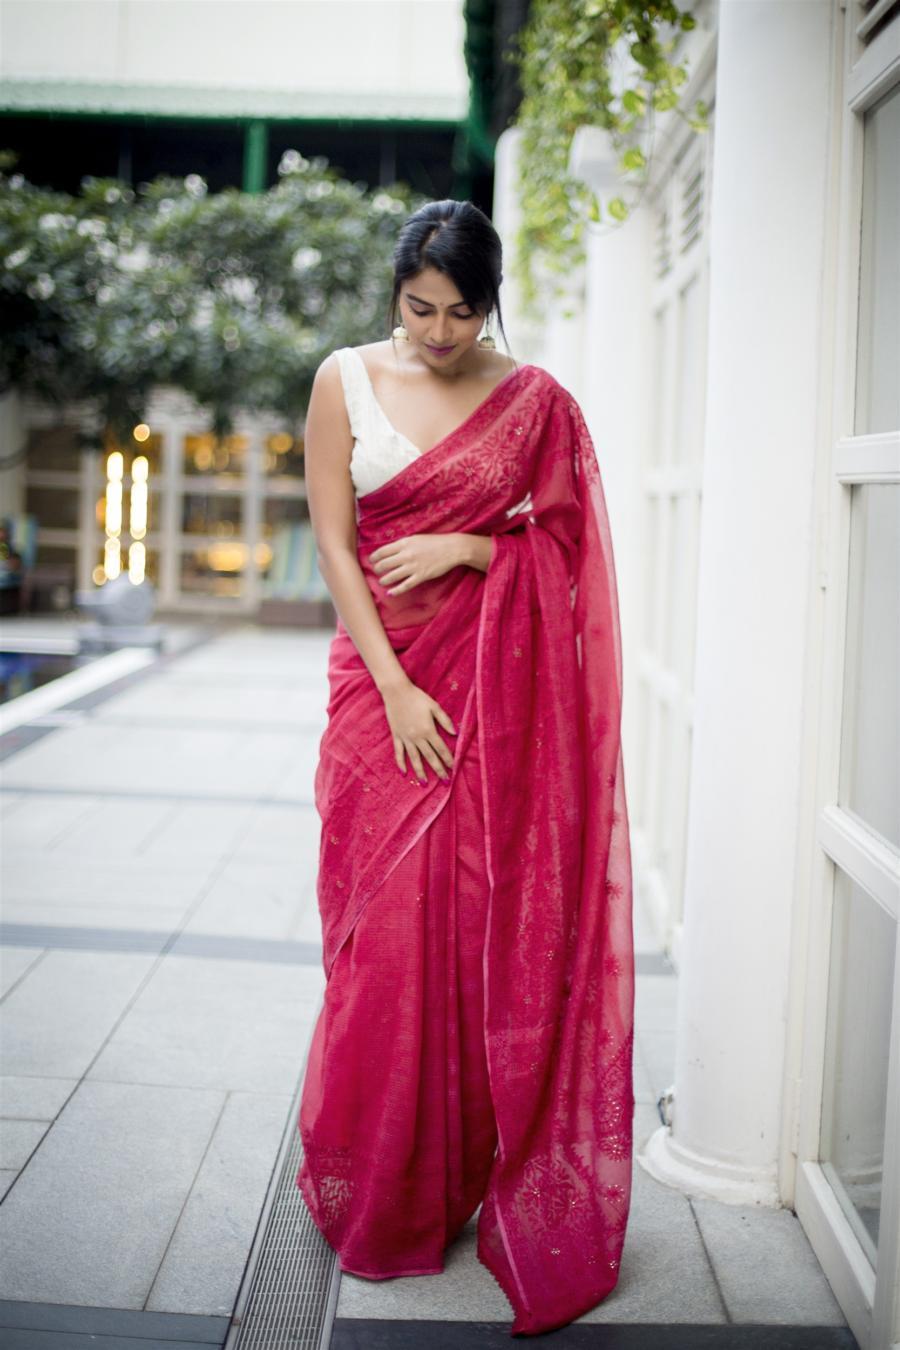 Glamorous Indian Model Amala Paul in Sleeveless Red Saree